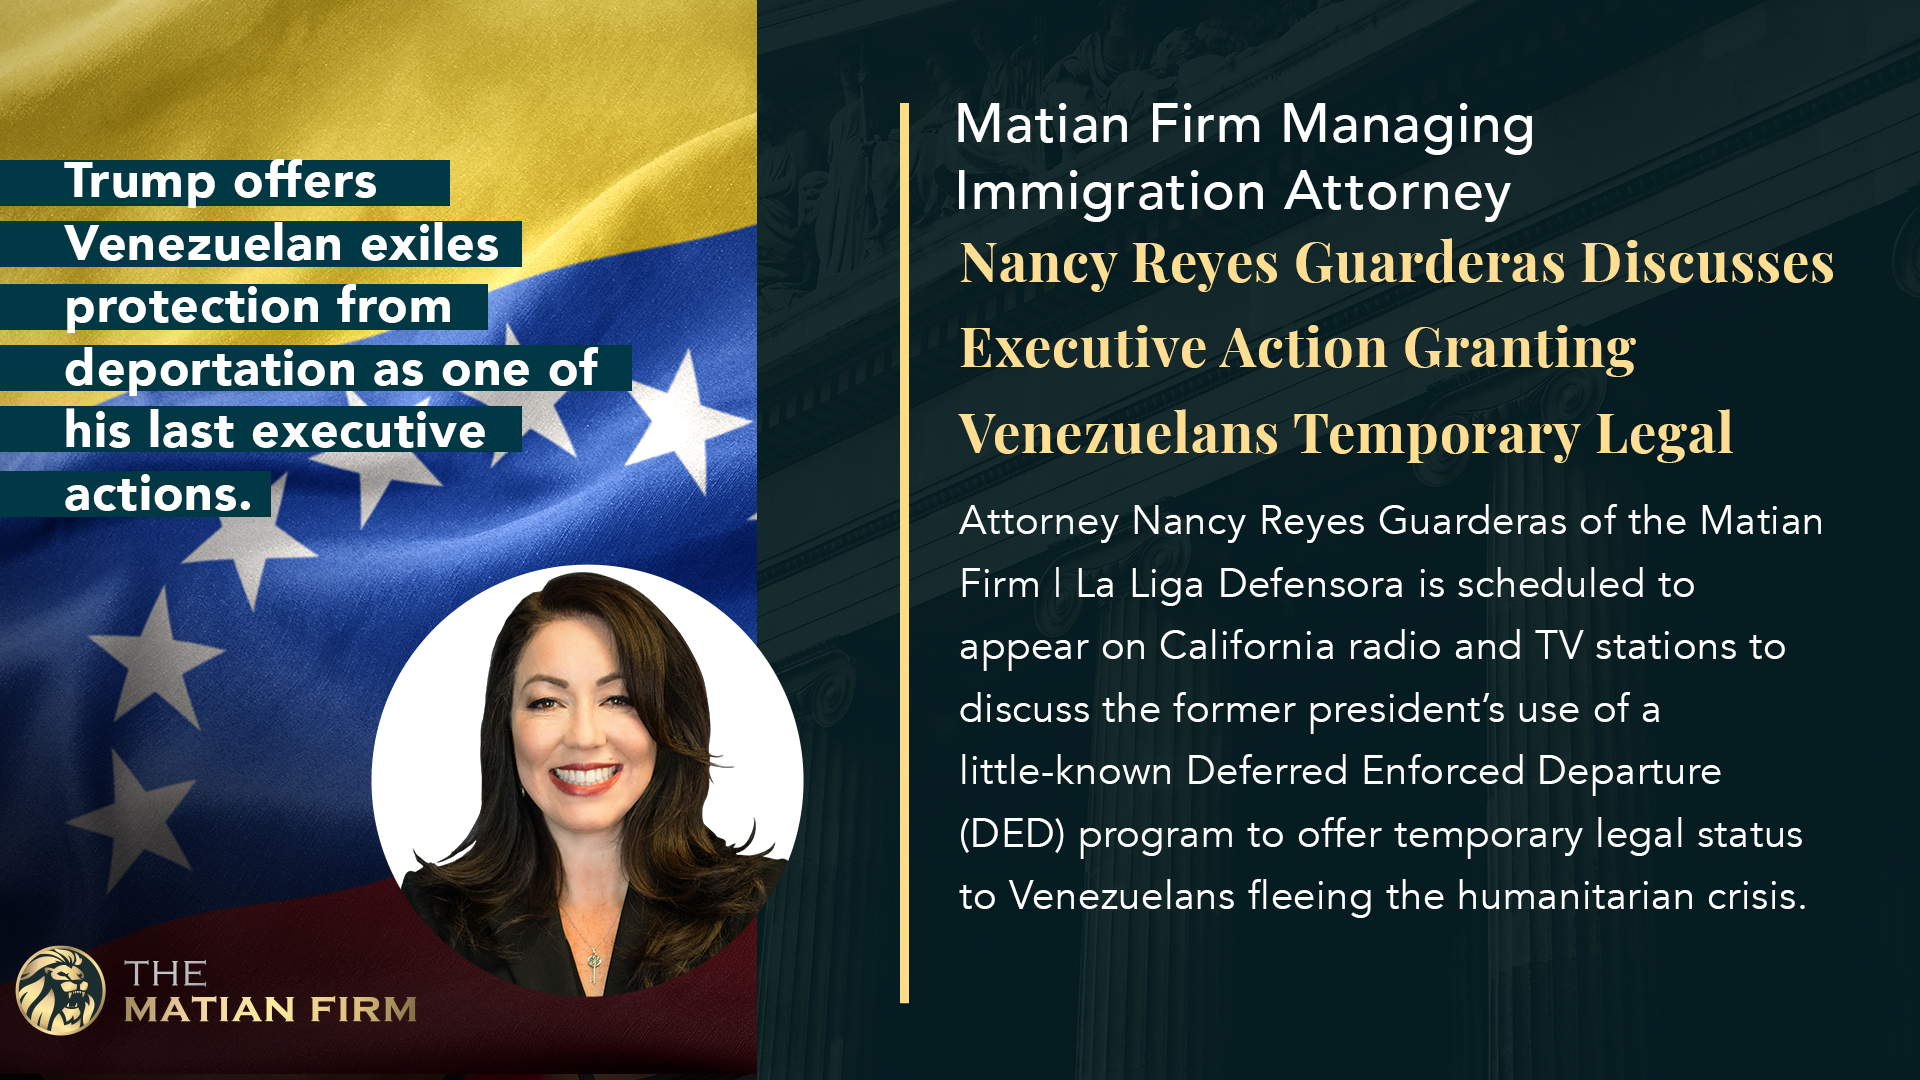 Matian Firm | La Liga Defensora Managing Immigration Attorney Nancy Reyes Guarderas Discusses Executive Action Granting Venezuelans Temporary Legal Status